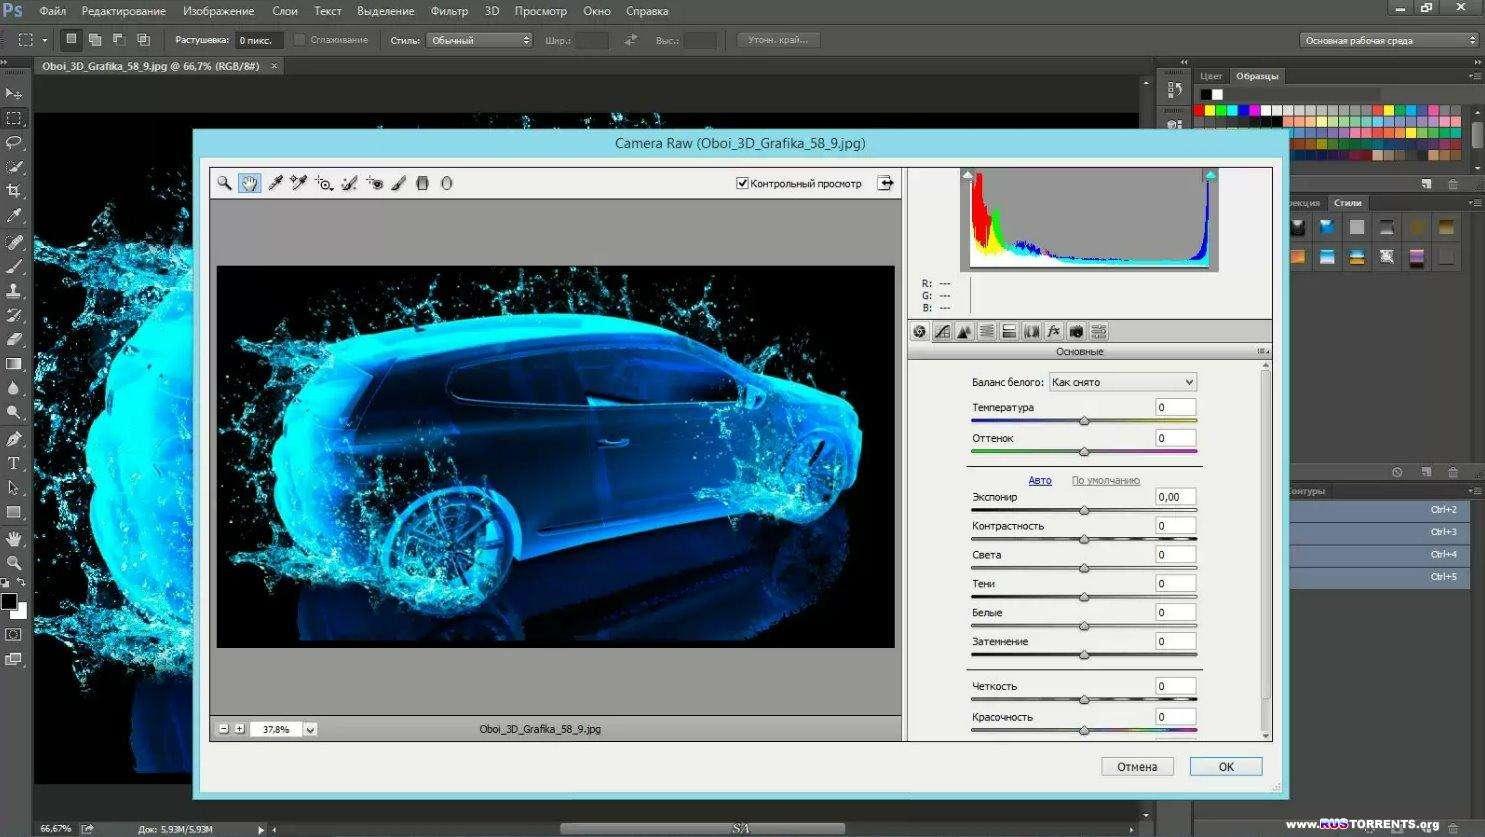 Adobe Photoshop CC 2014.2.0 Final RePack by D!akov